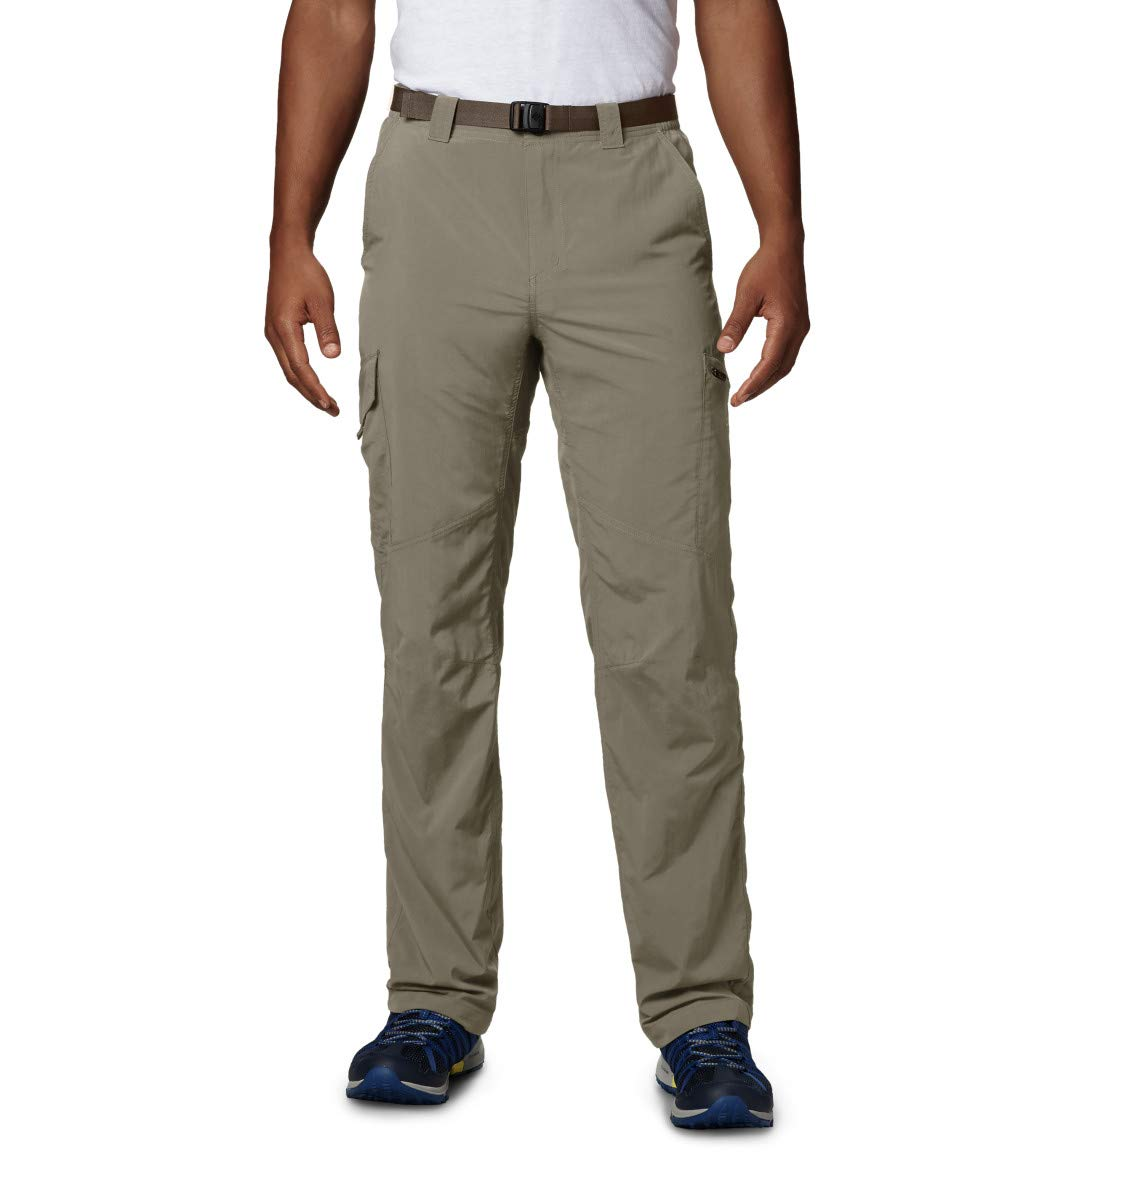 Columbia Men's  Men's Silver Ridge Cargo Pant , Tusk, 34x30